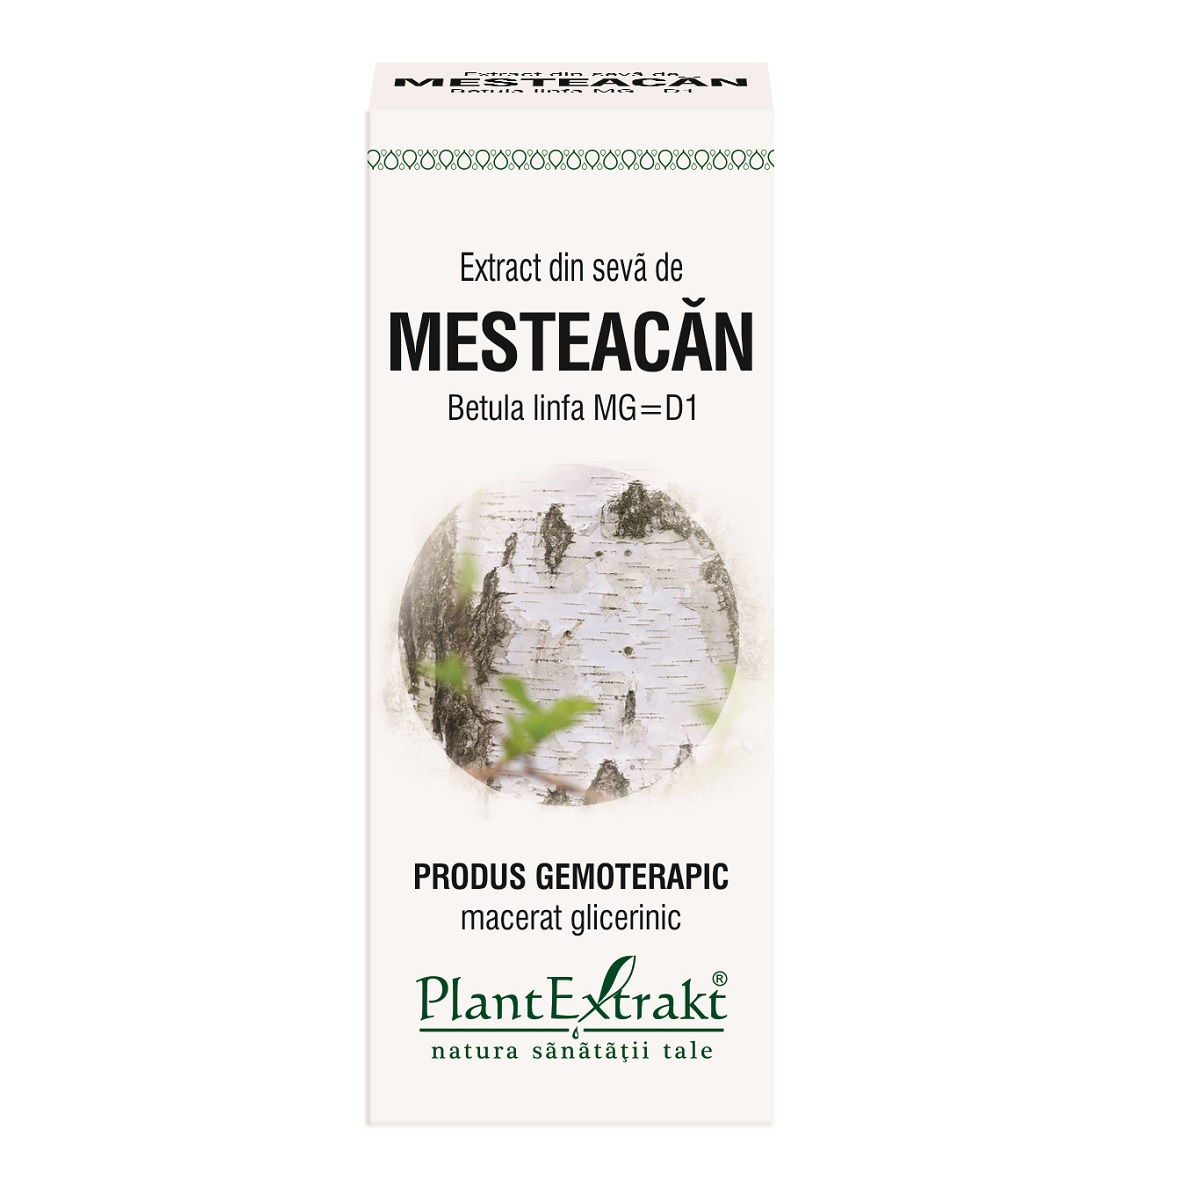 Extract din seva de mesteacan, 50ml, Plant Extrakt drmax poza